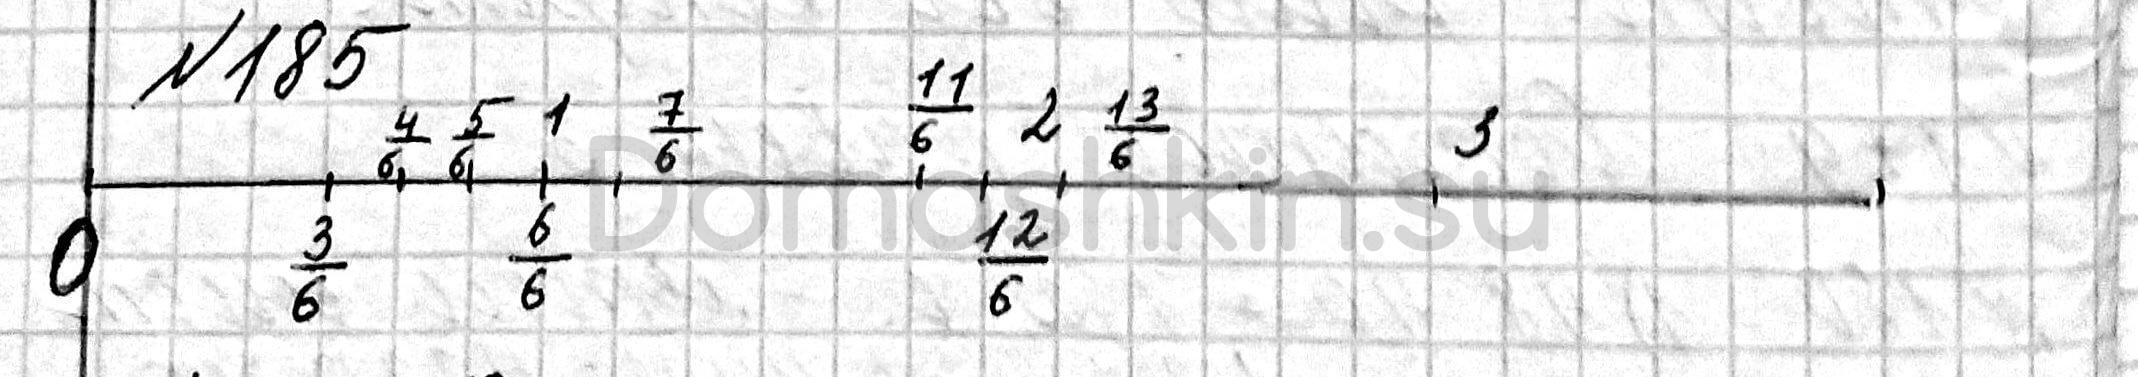 Математика 6 класс учебник Мерзляк номер 185 решение